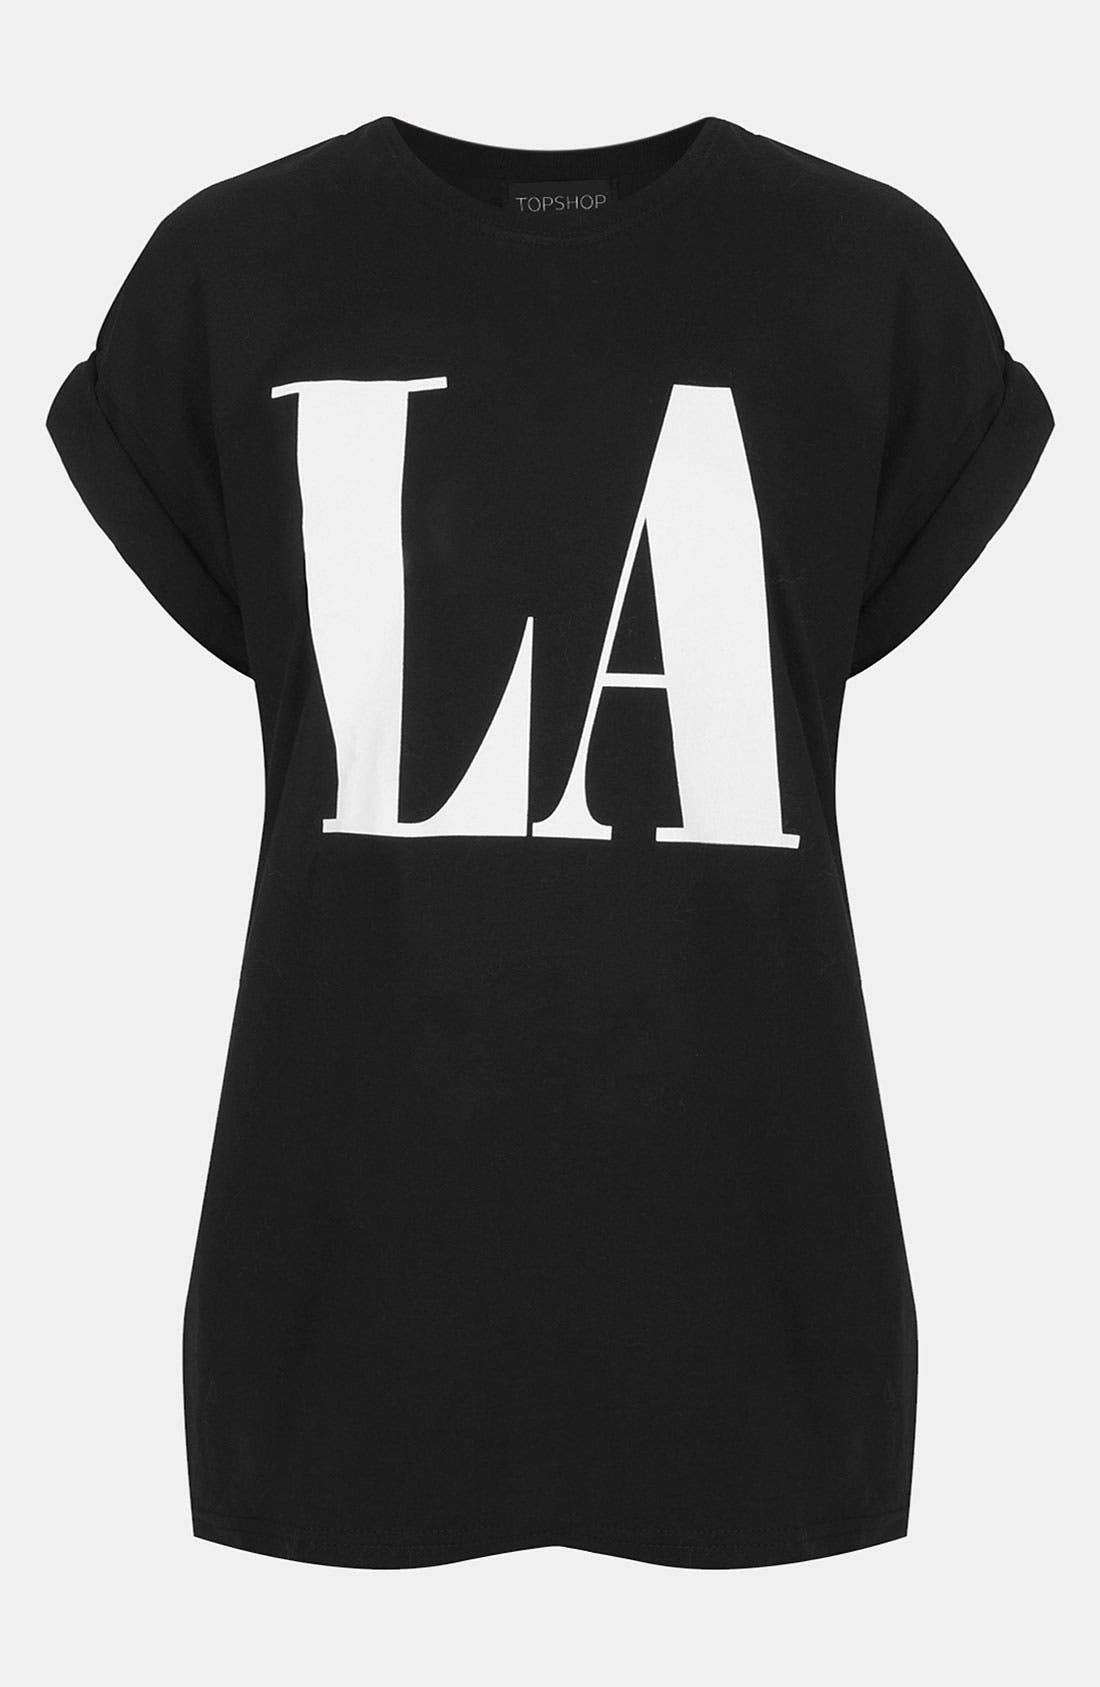 Main Image - Topshop 'LA' Roll Sleeve Graphic Tee